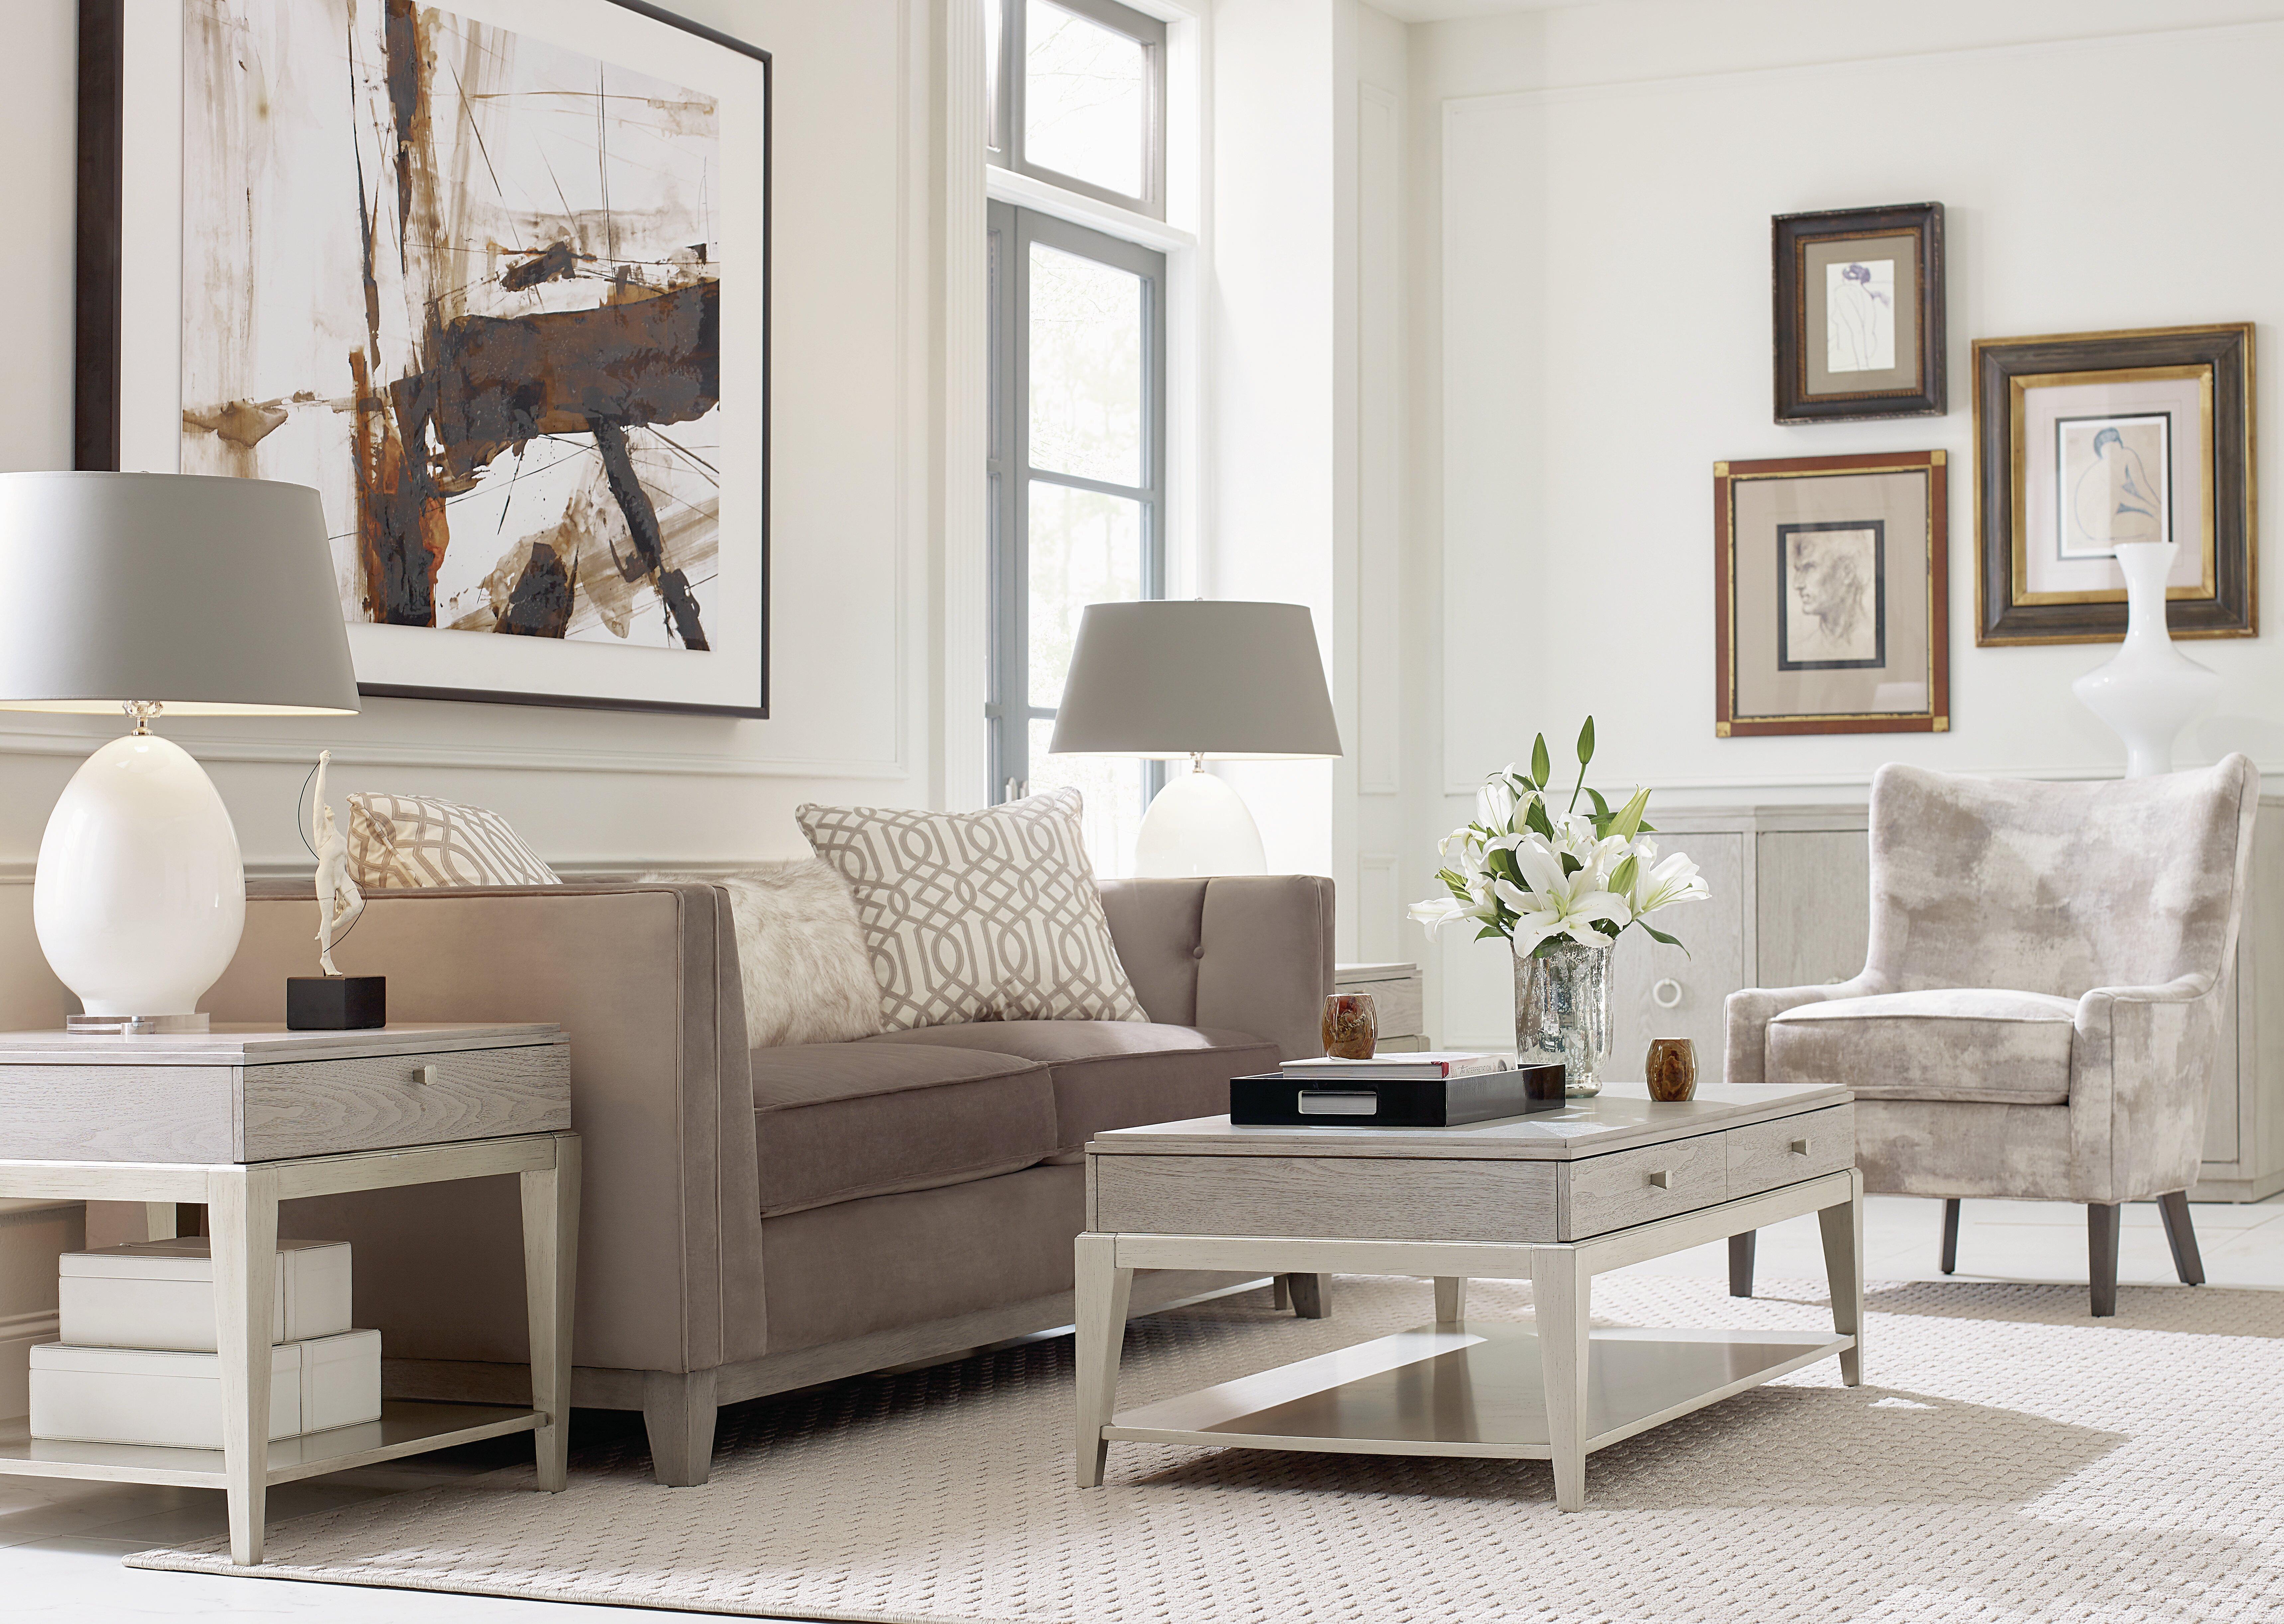 Fancy Living Room Cinema Ensign - Living Room Design Ideas ...